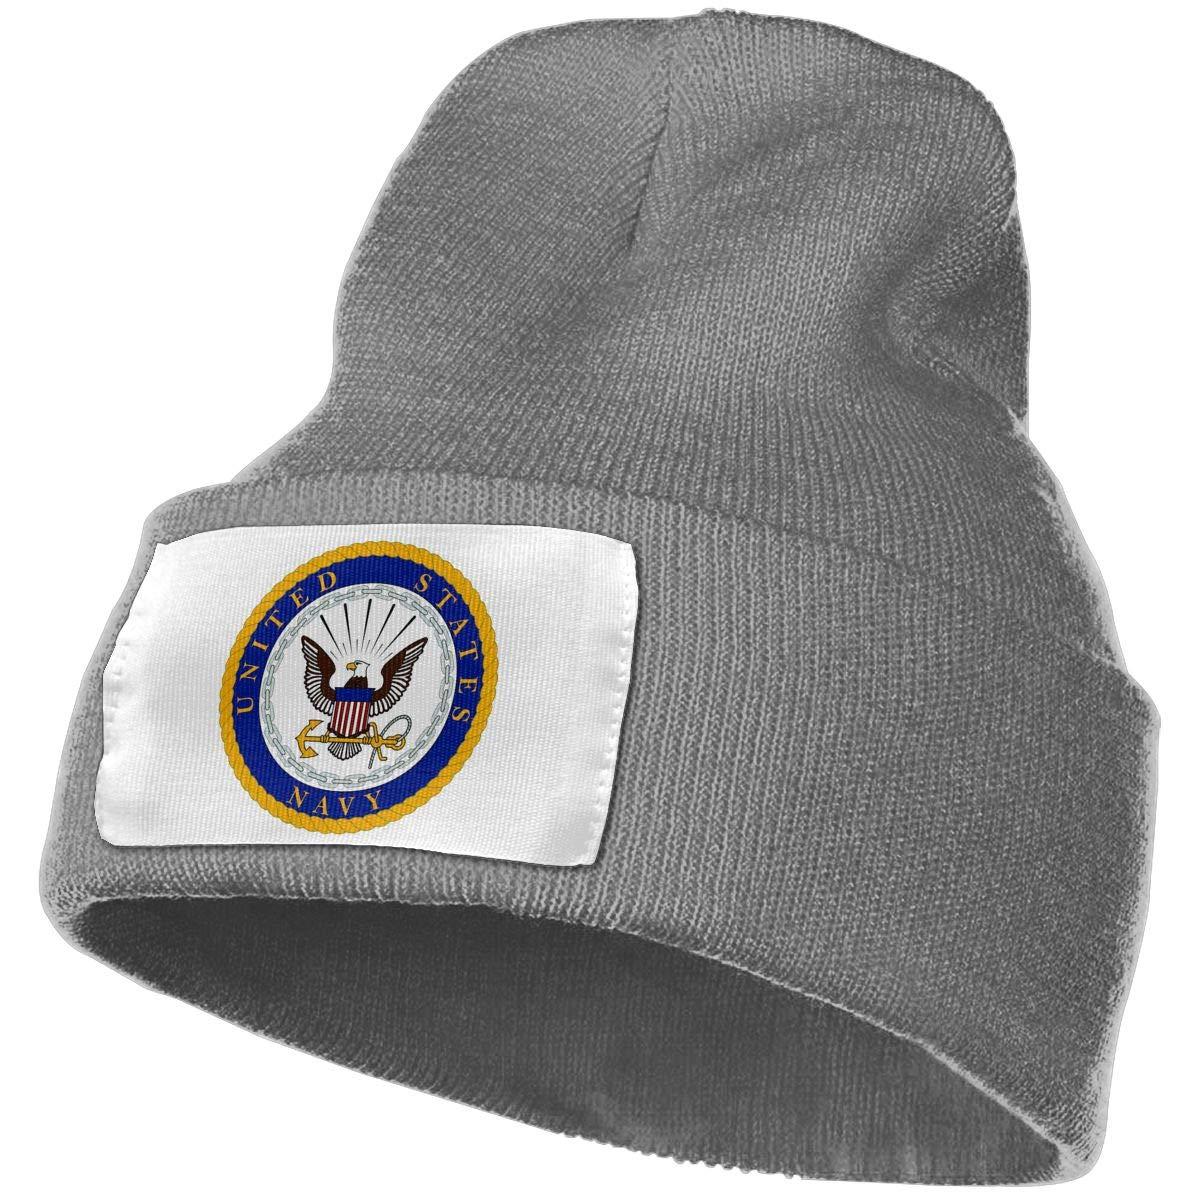 FORDSAN CP US Navy Department Seal Mens Beanie Cap Skull Cap Winter Warm Knitting Hats.